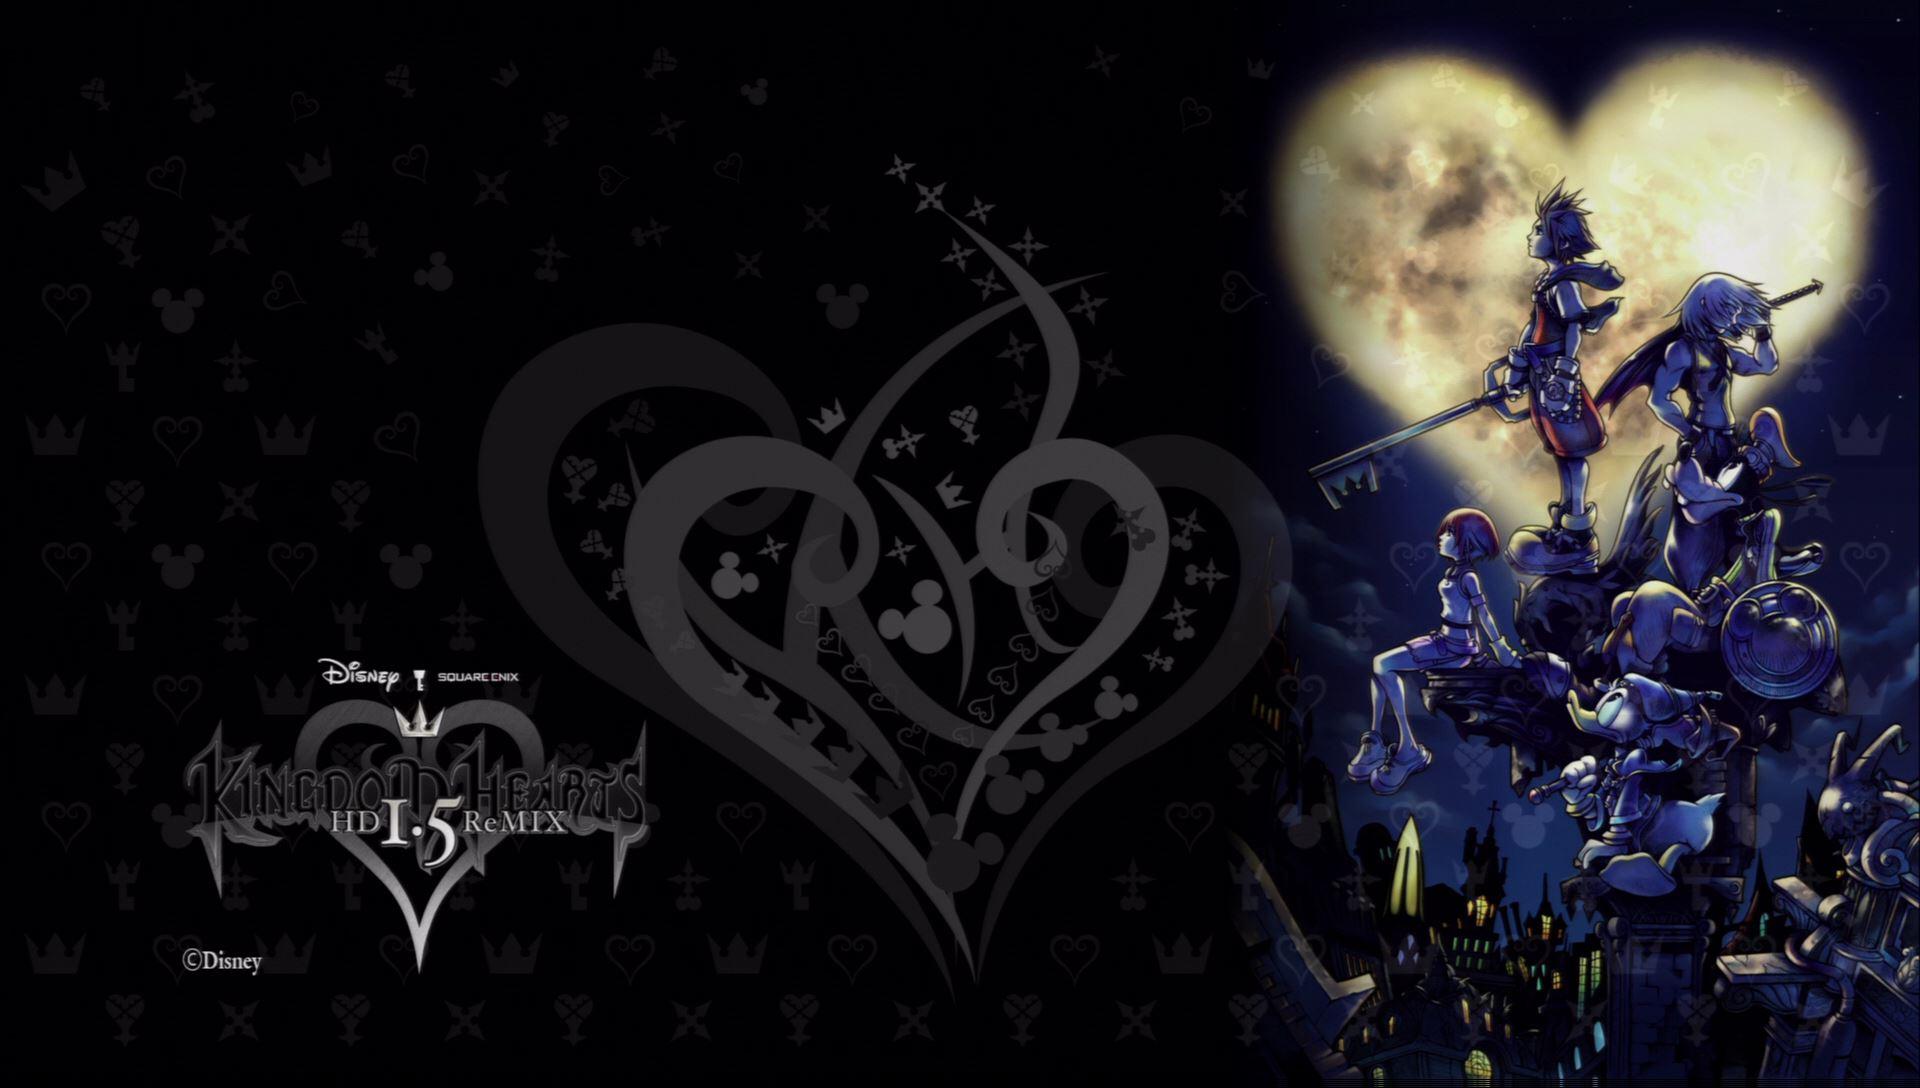 Free Download Kingdom Hearts Final Mix Hd Theme By Myriamsephiroth